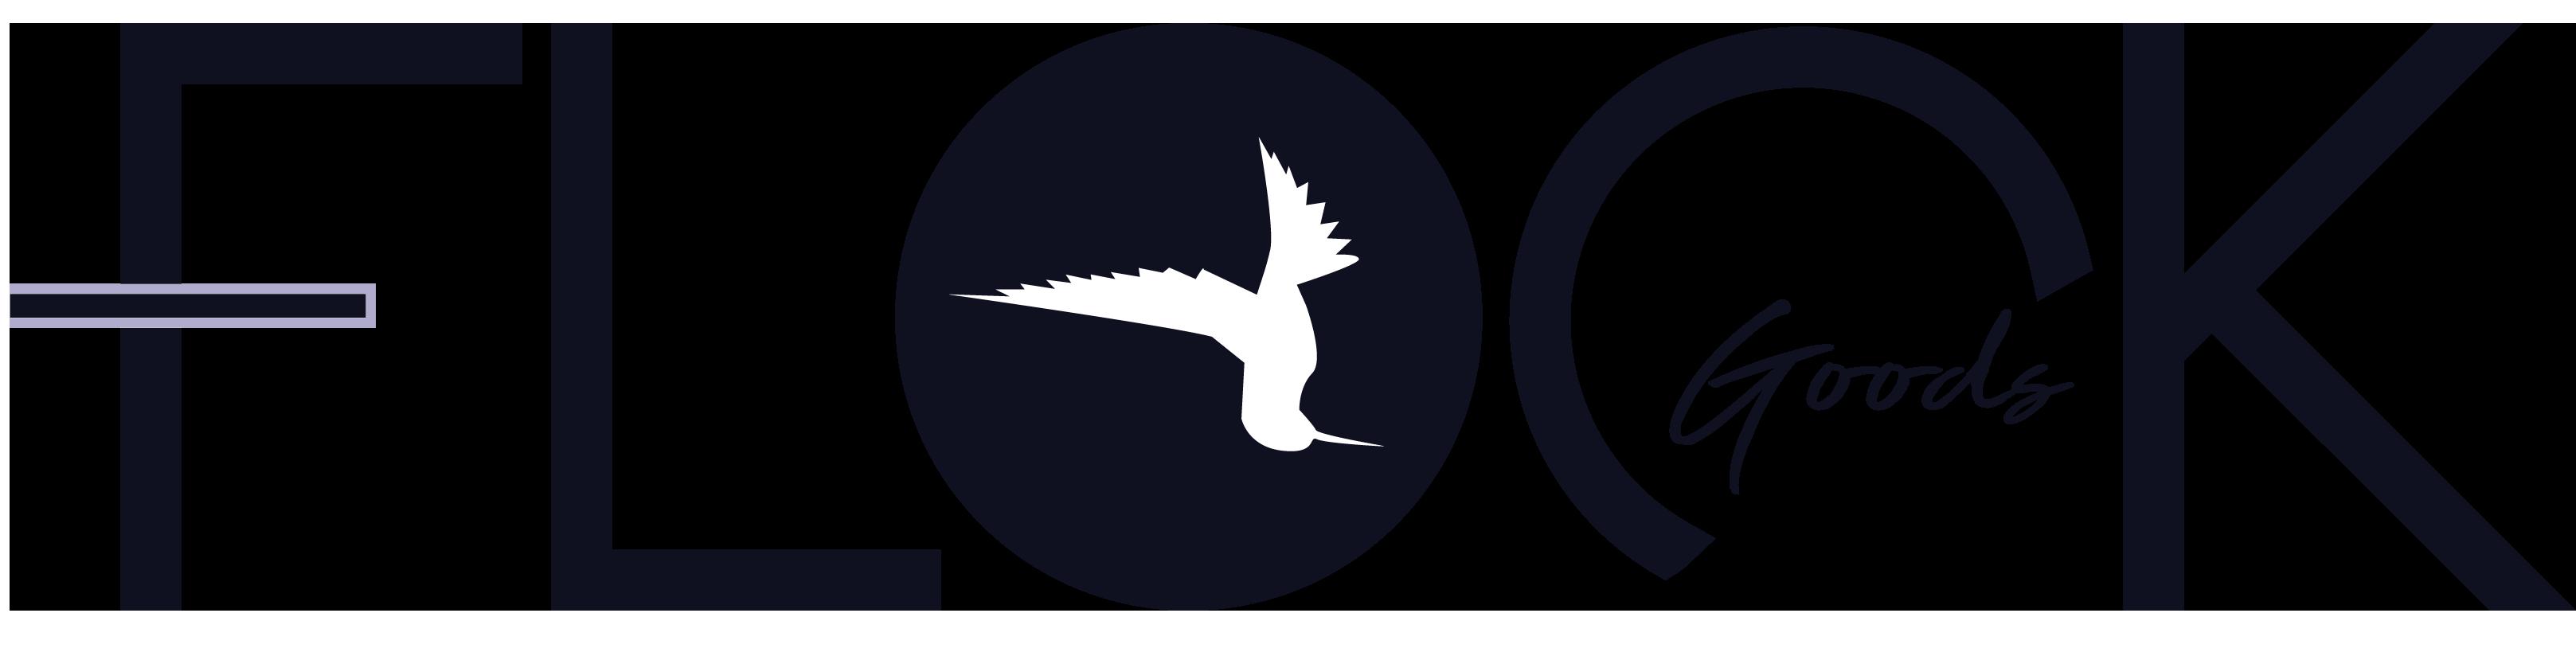 Flock Goods